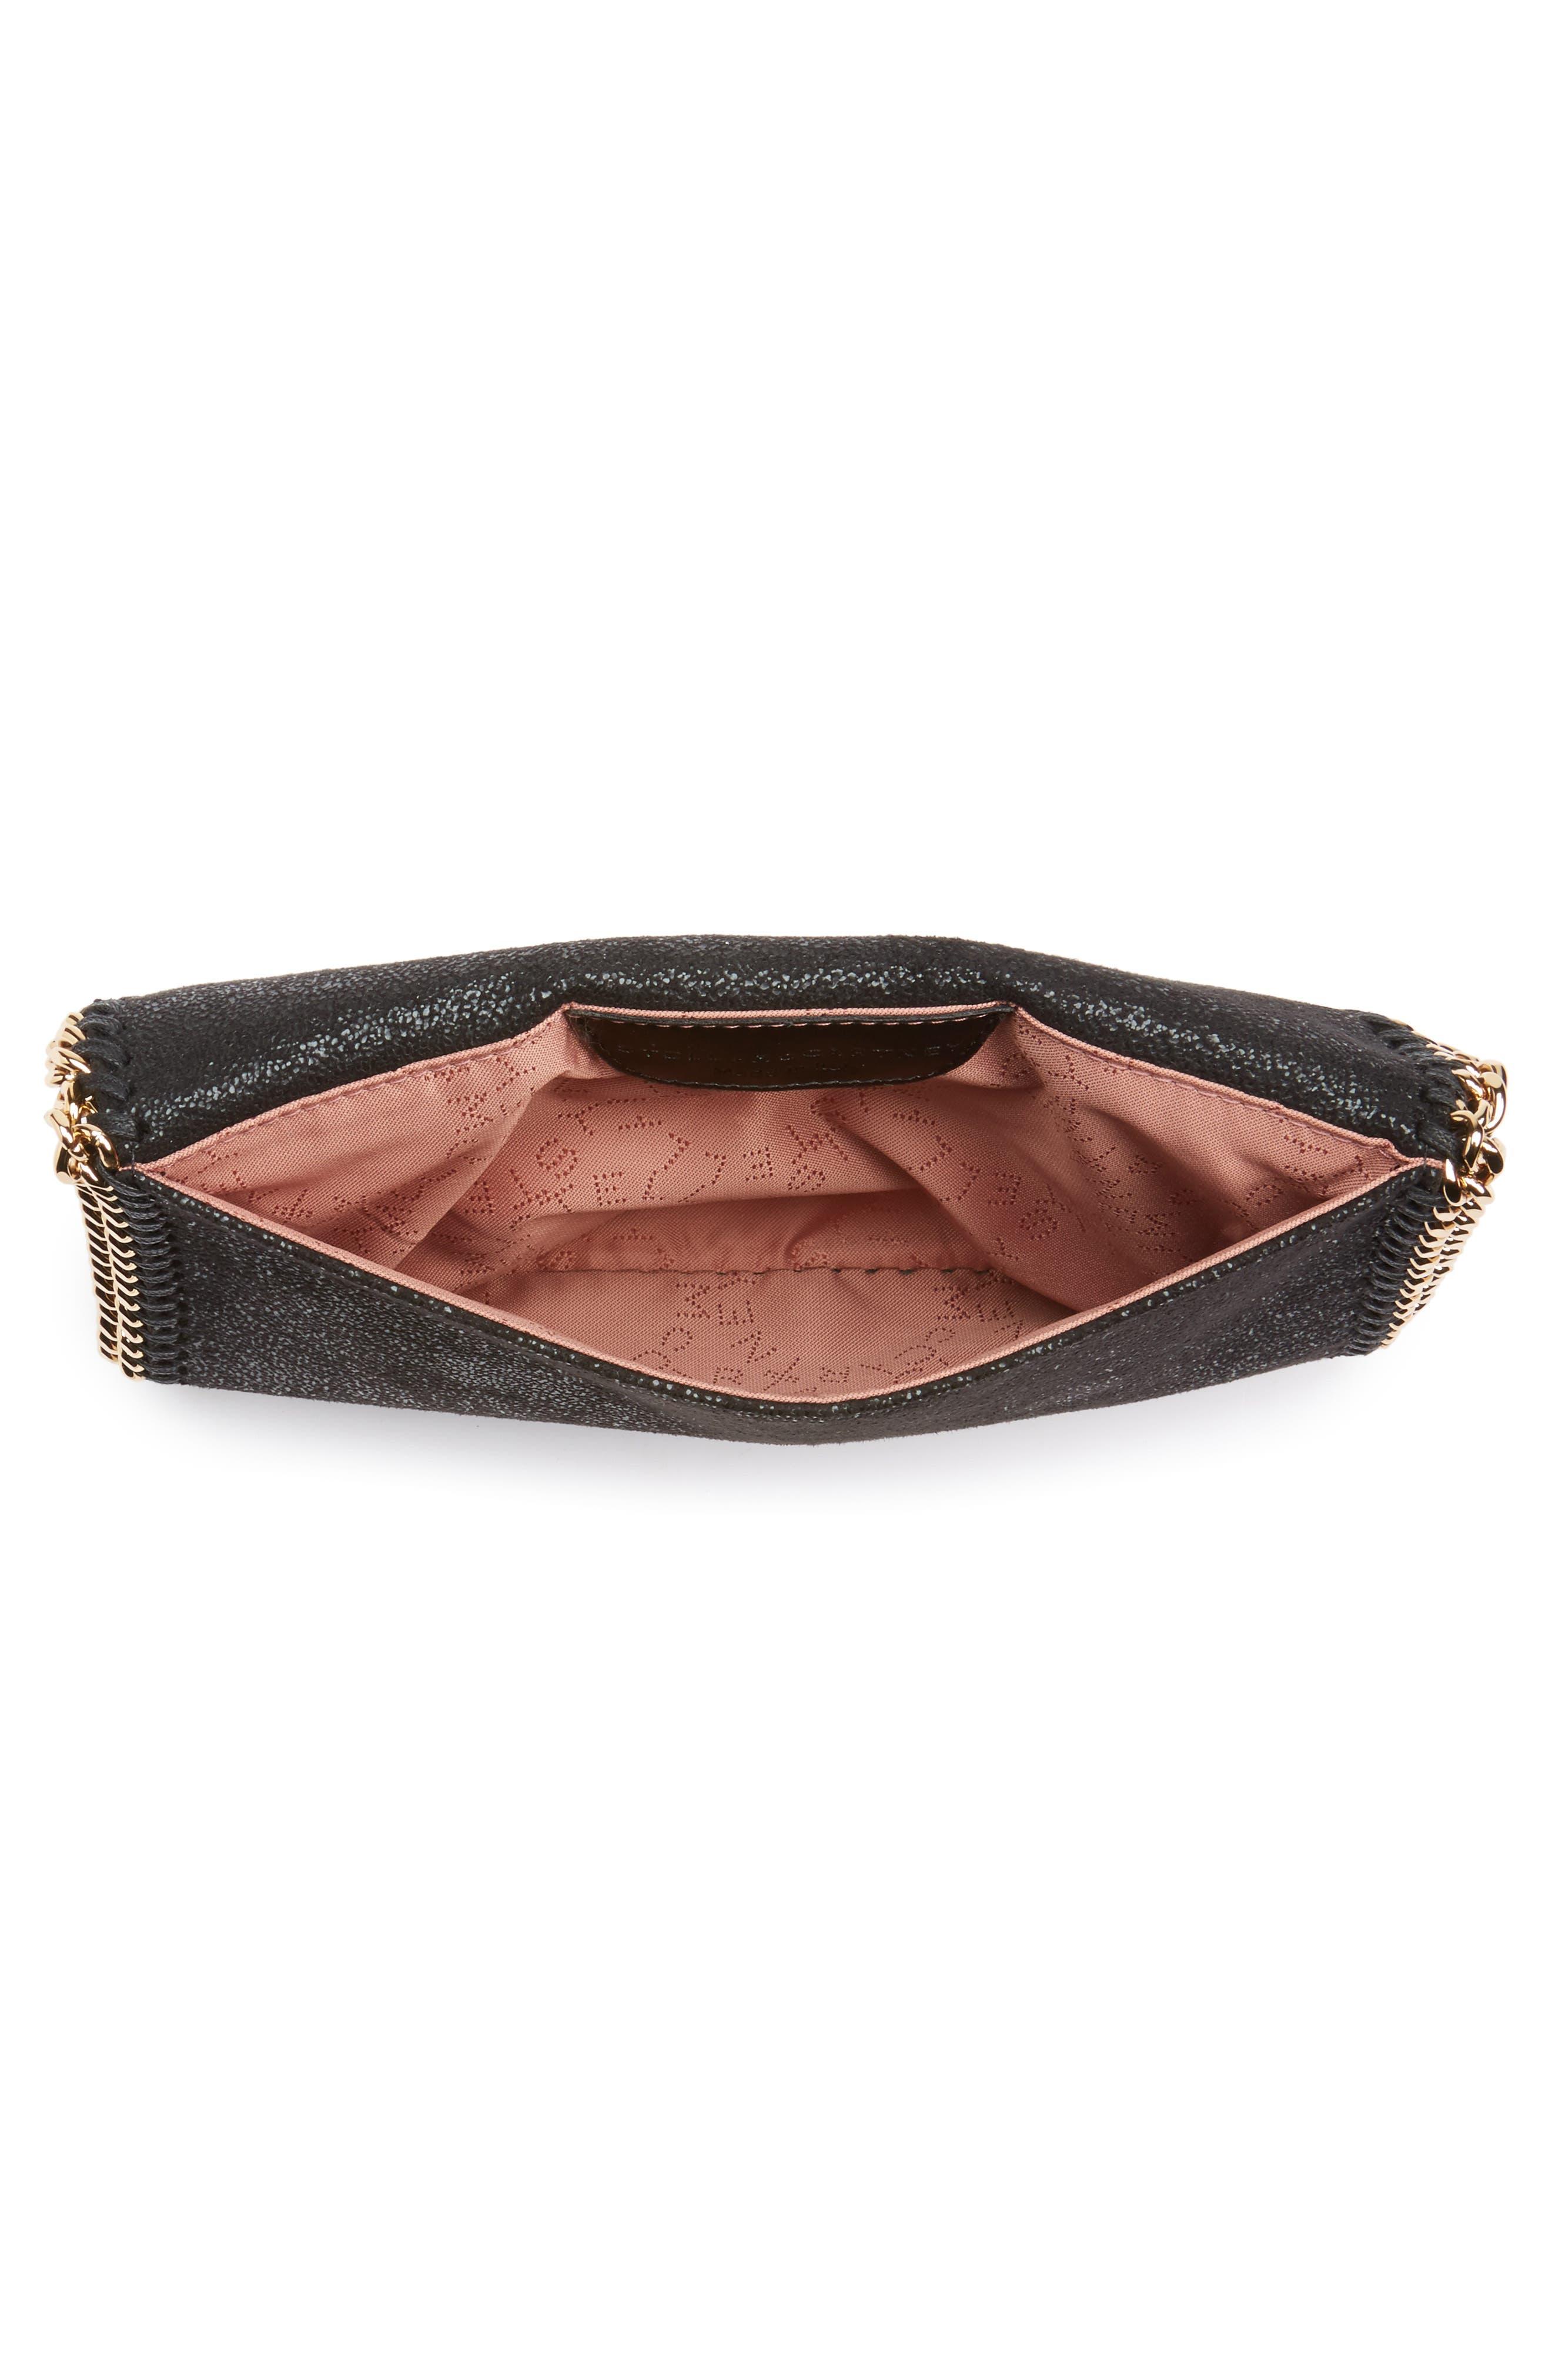 Mini Falabella - Shaggy Deer Faux Leather Crossbody Bag,                             Alternate thumbnail 4, color,                             001